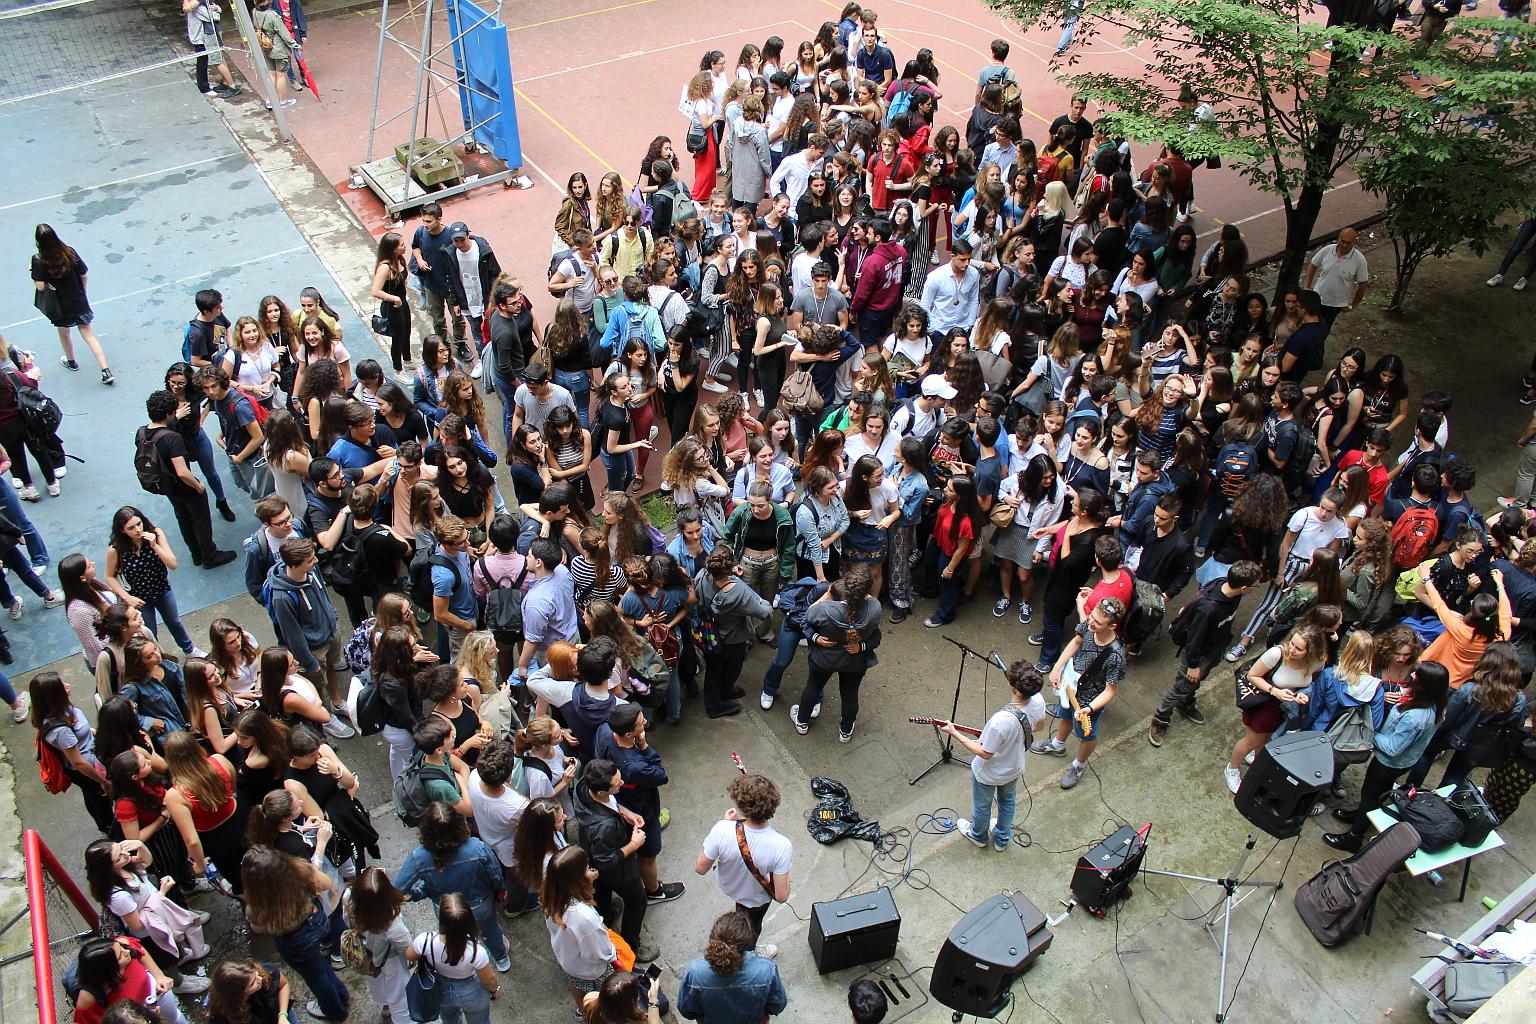 foto di concerto al Berchet